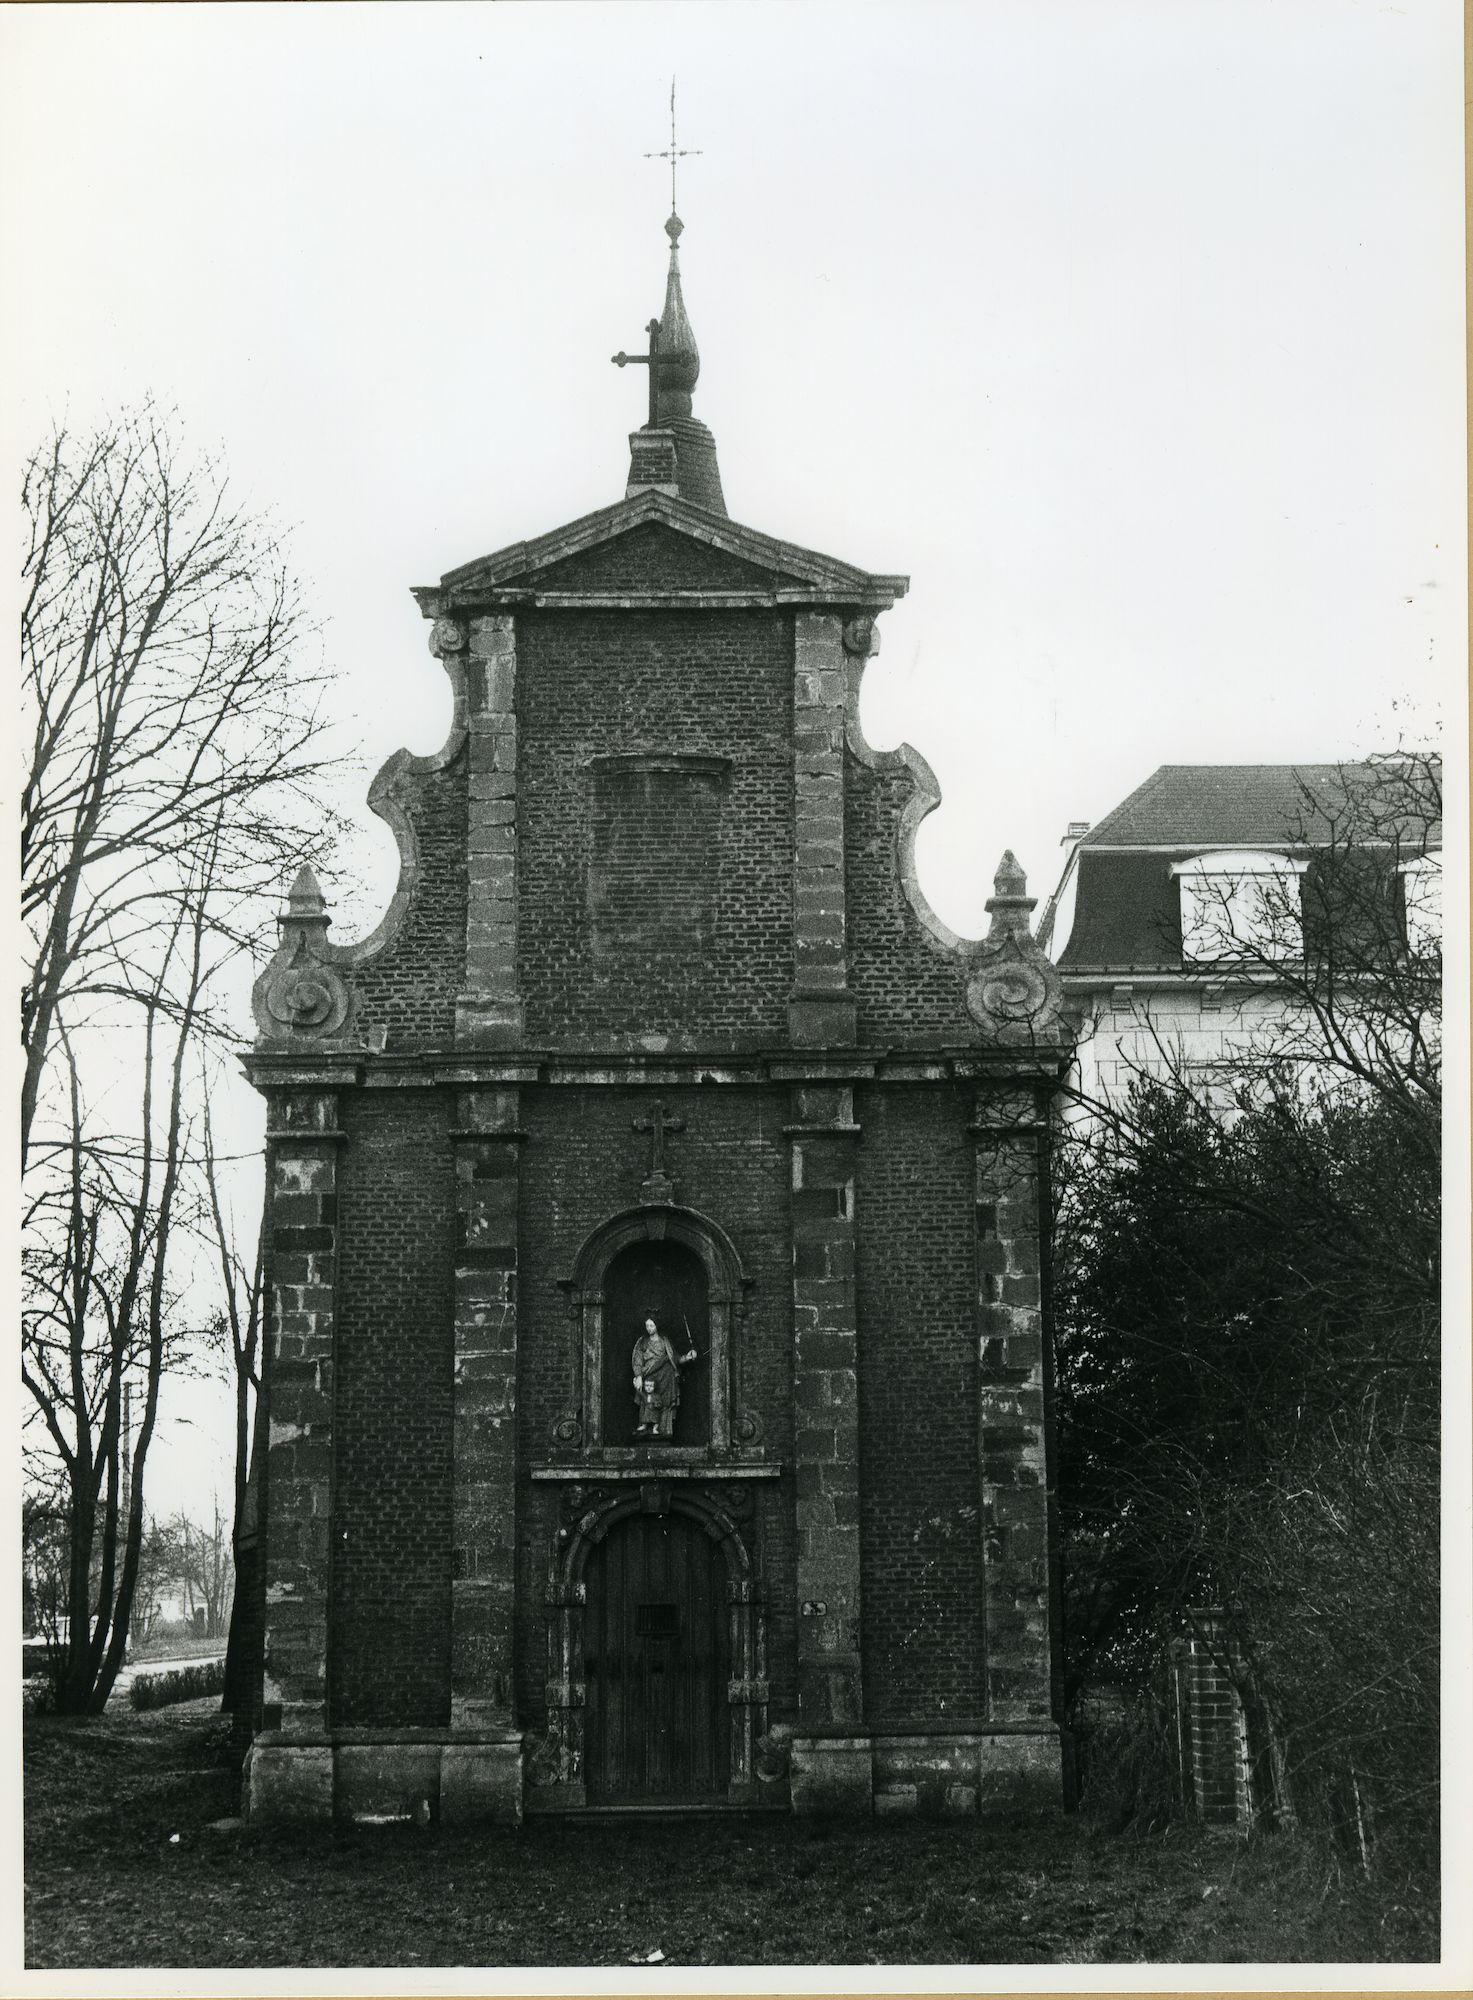 Sint-Denijs-Westrem: Putkapelstraat: Kapel